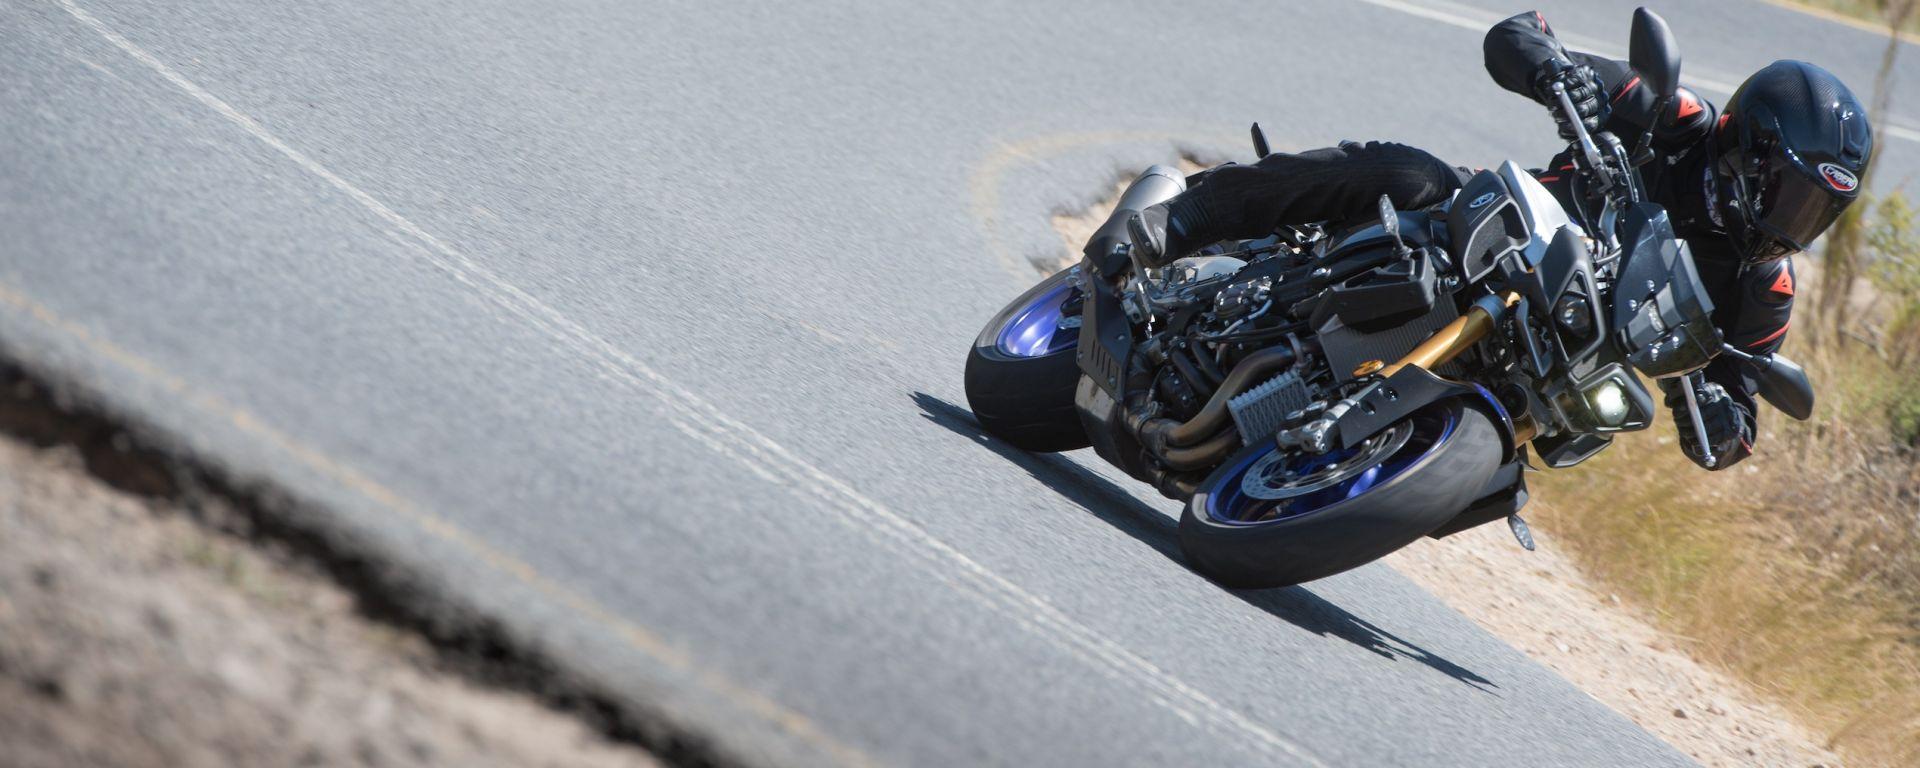 Yamaha MT-10 SP, stabile e precisa in curva